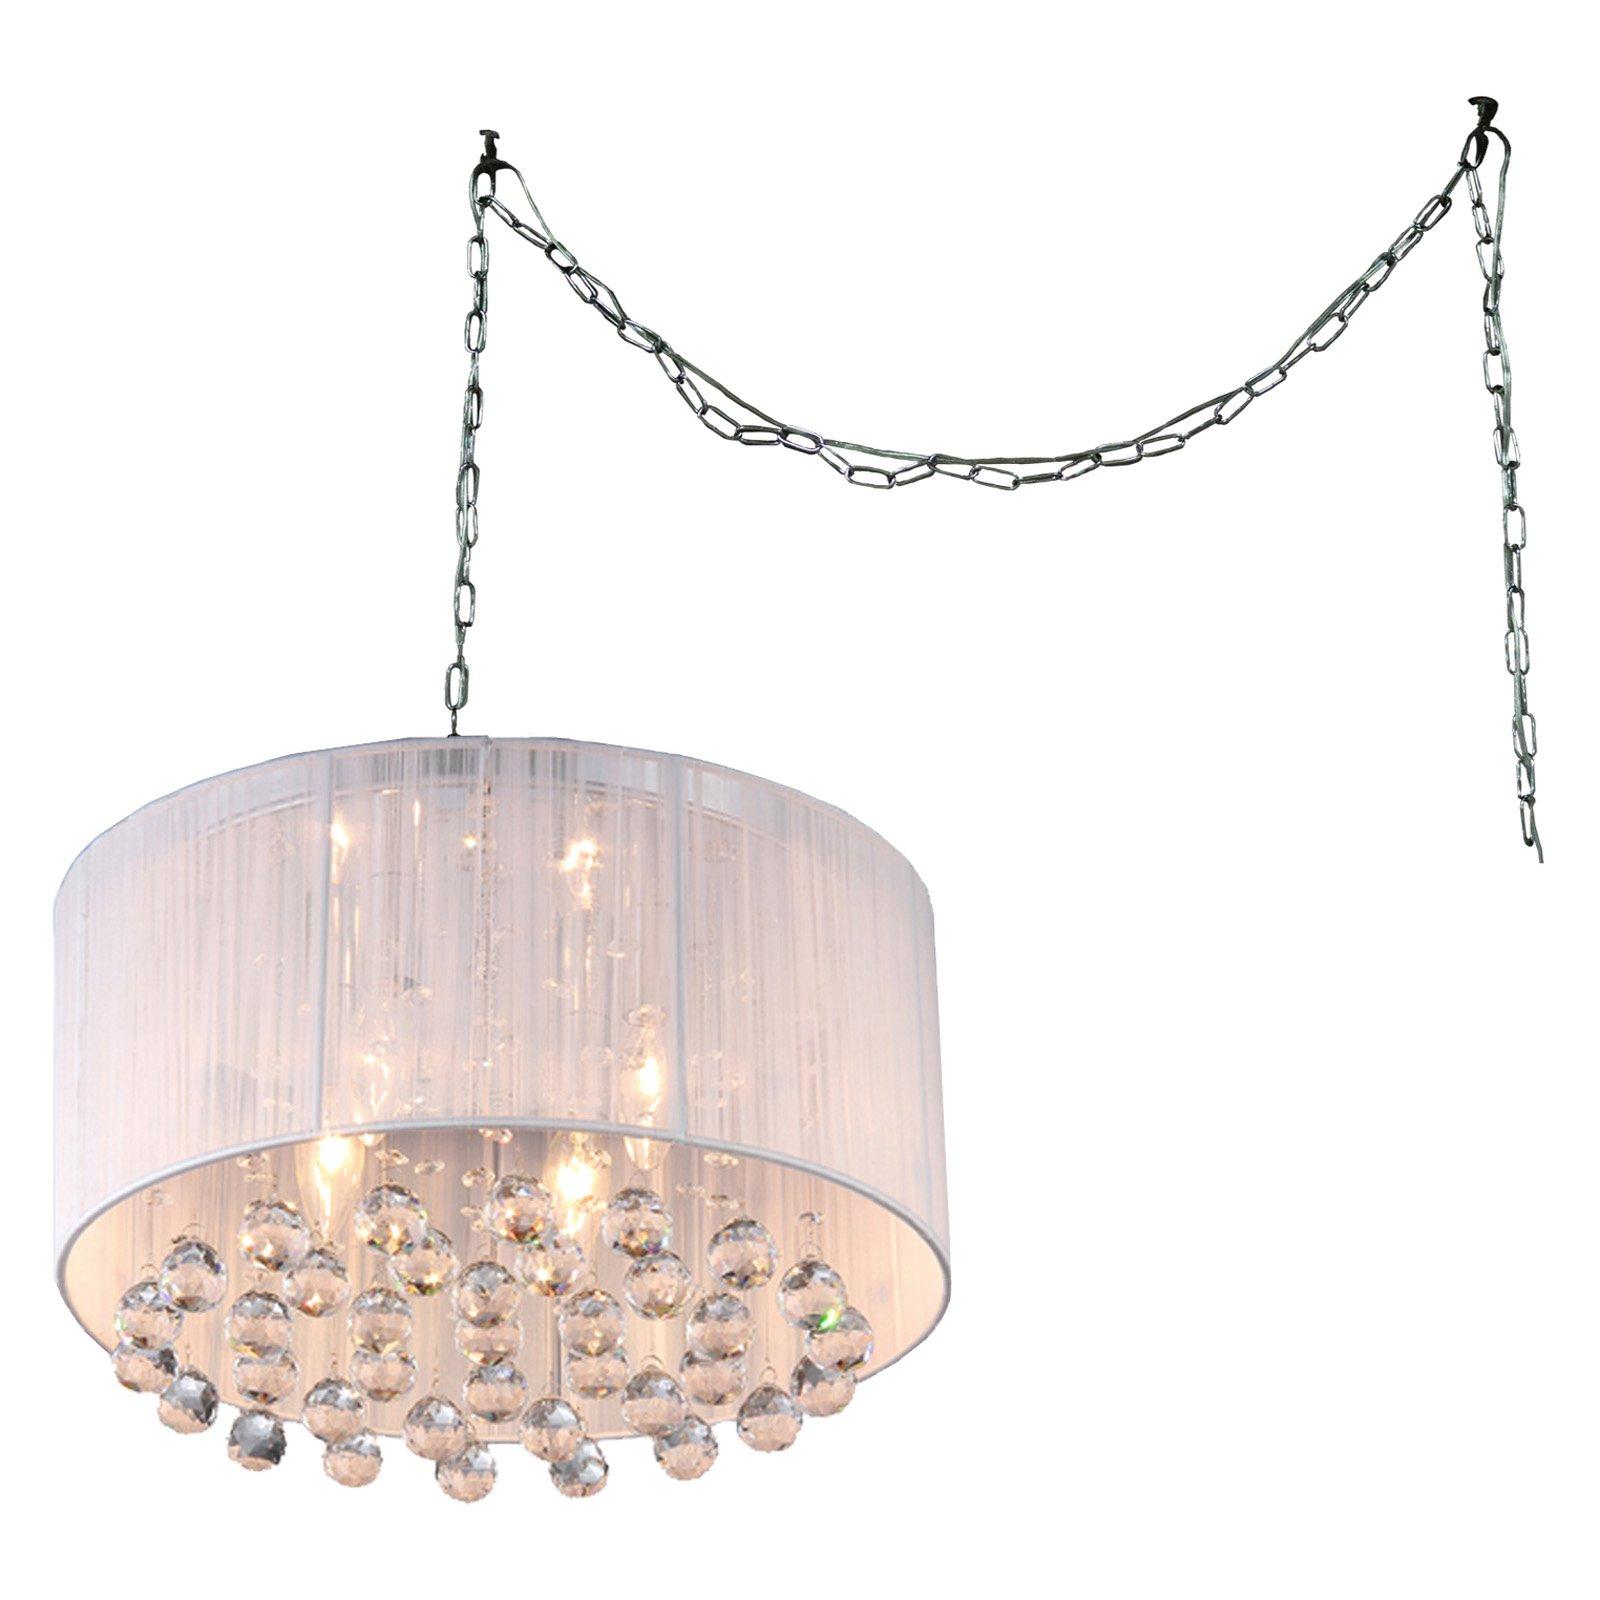 Warehouse of Tiffany Mineya 5-light White 17-inch Chrome Swag Lamp